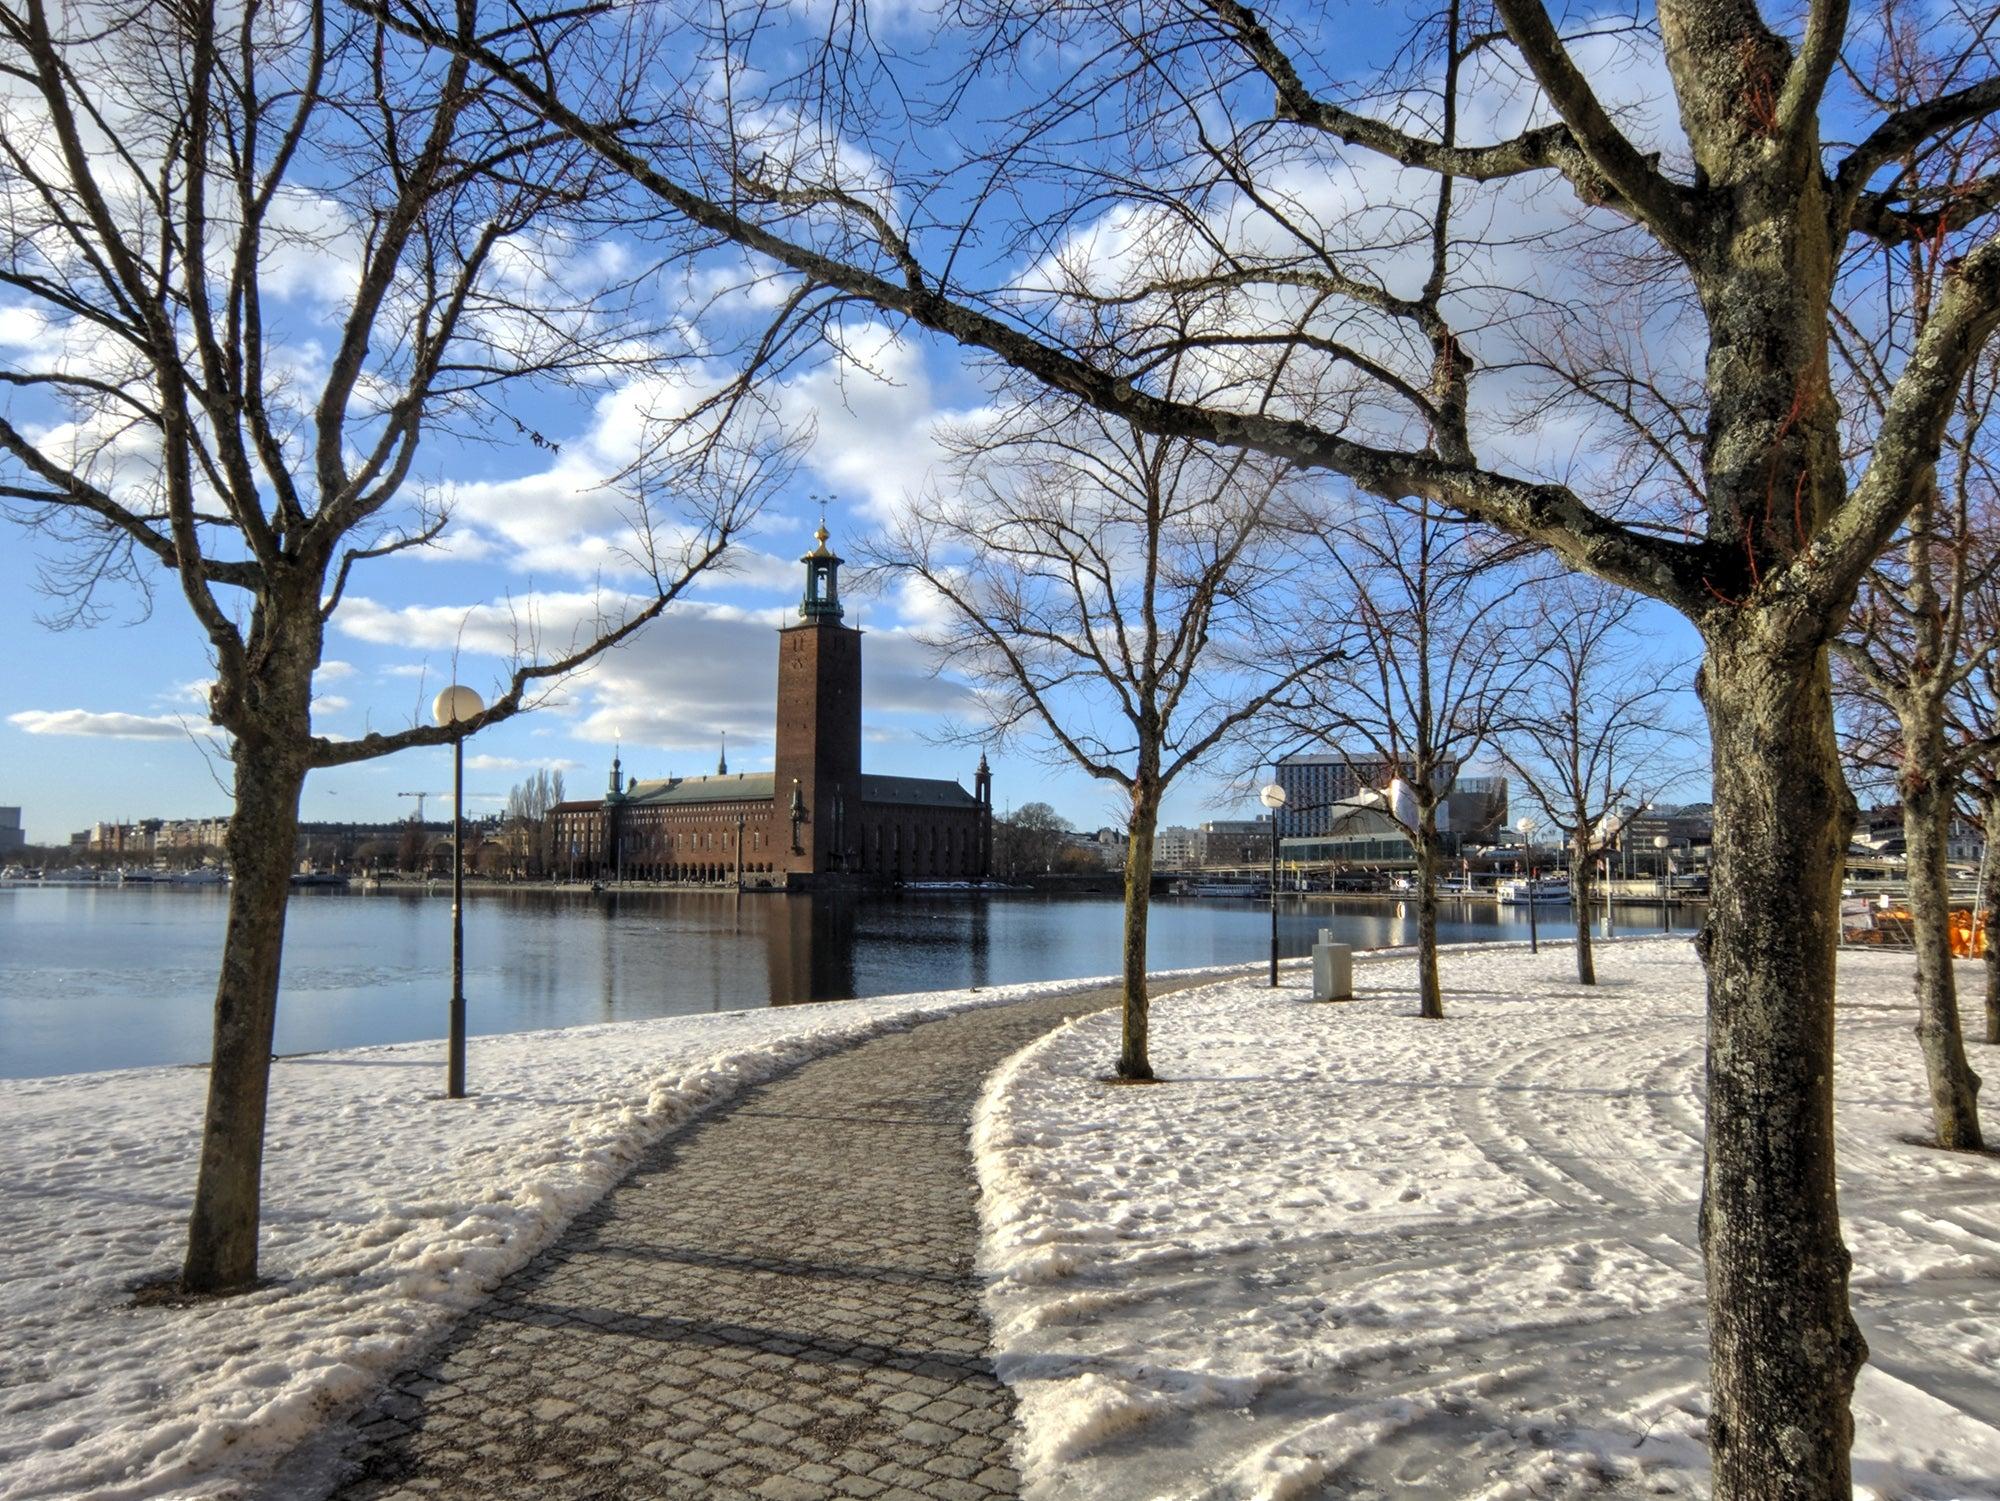 Stockholm winter running city